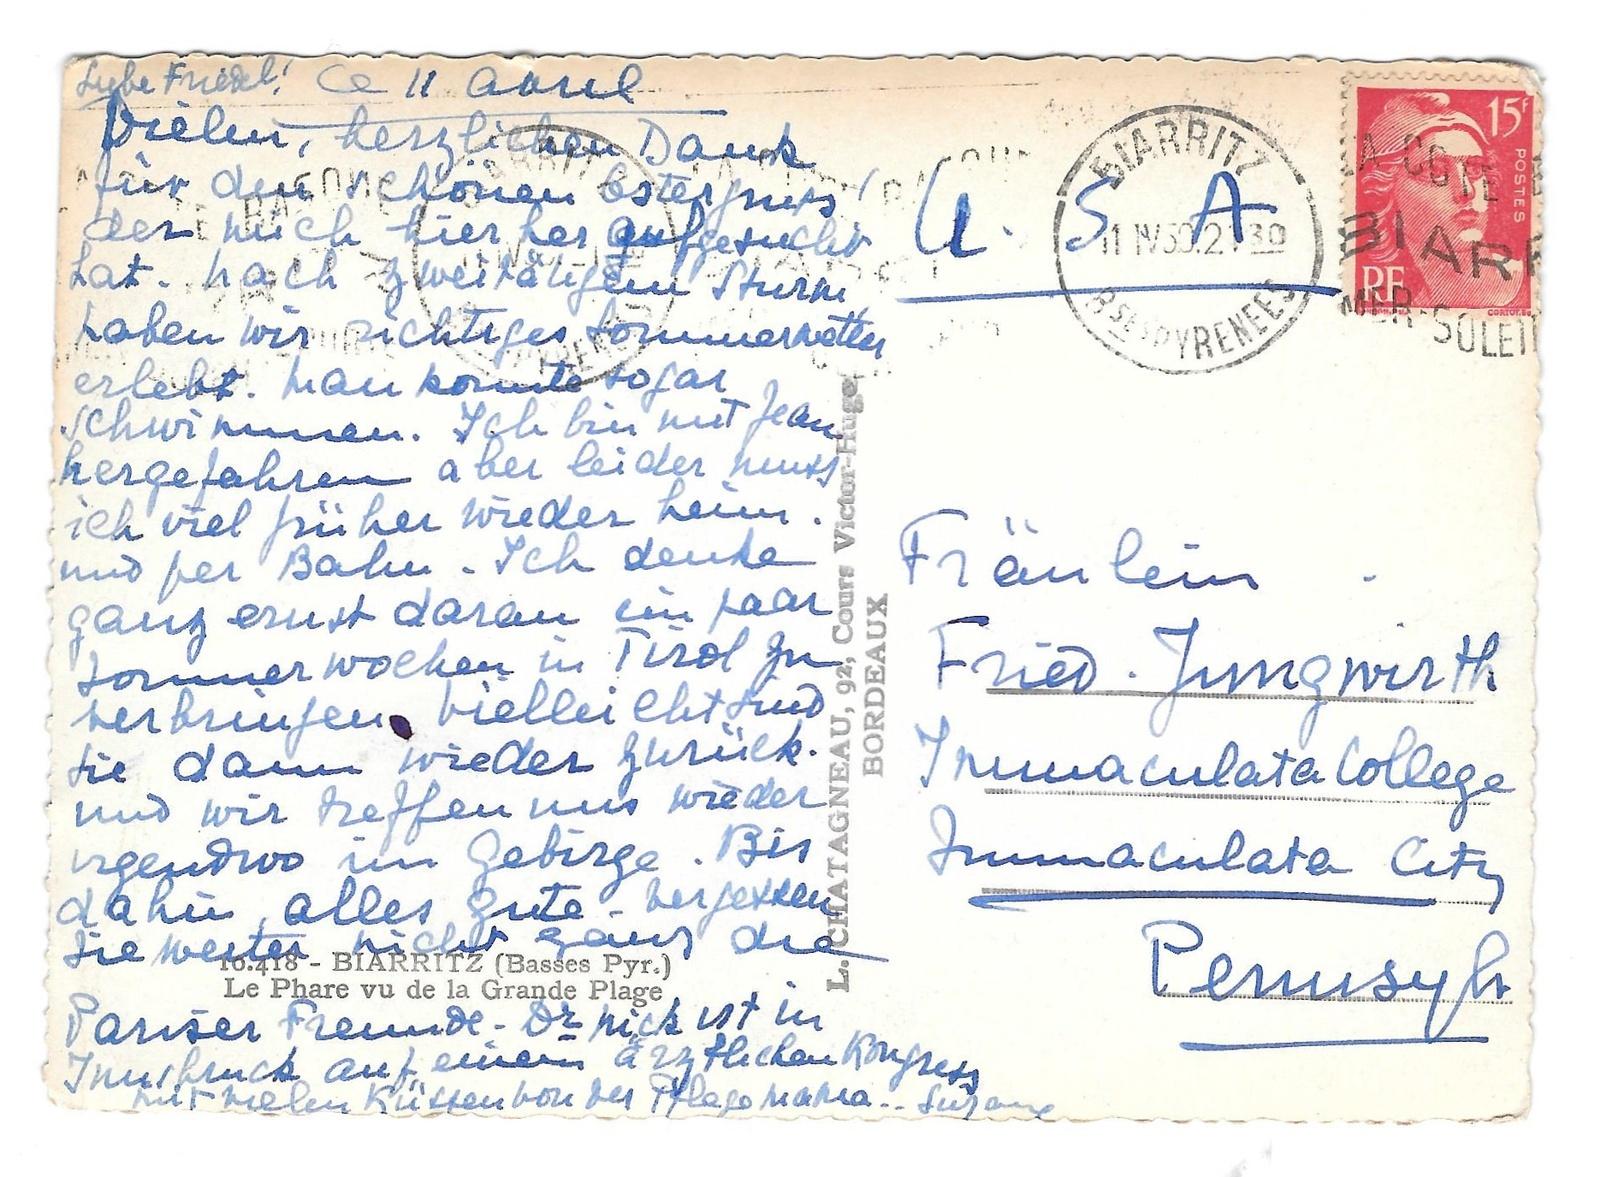 France Biarritz Lighthouse Grande Plage Beach Elce Glossy Photo Postcard 4X6